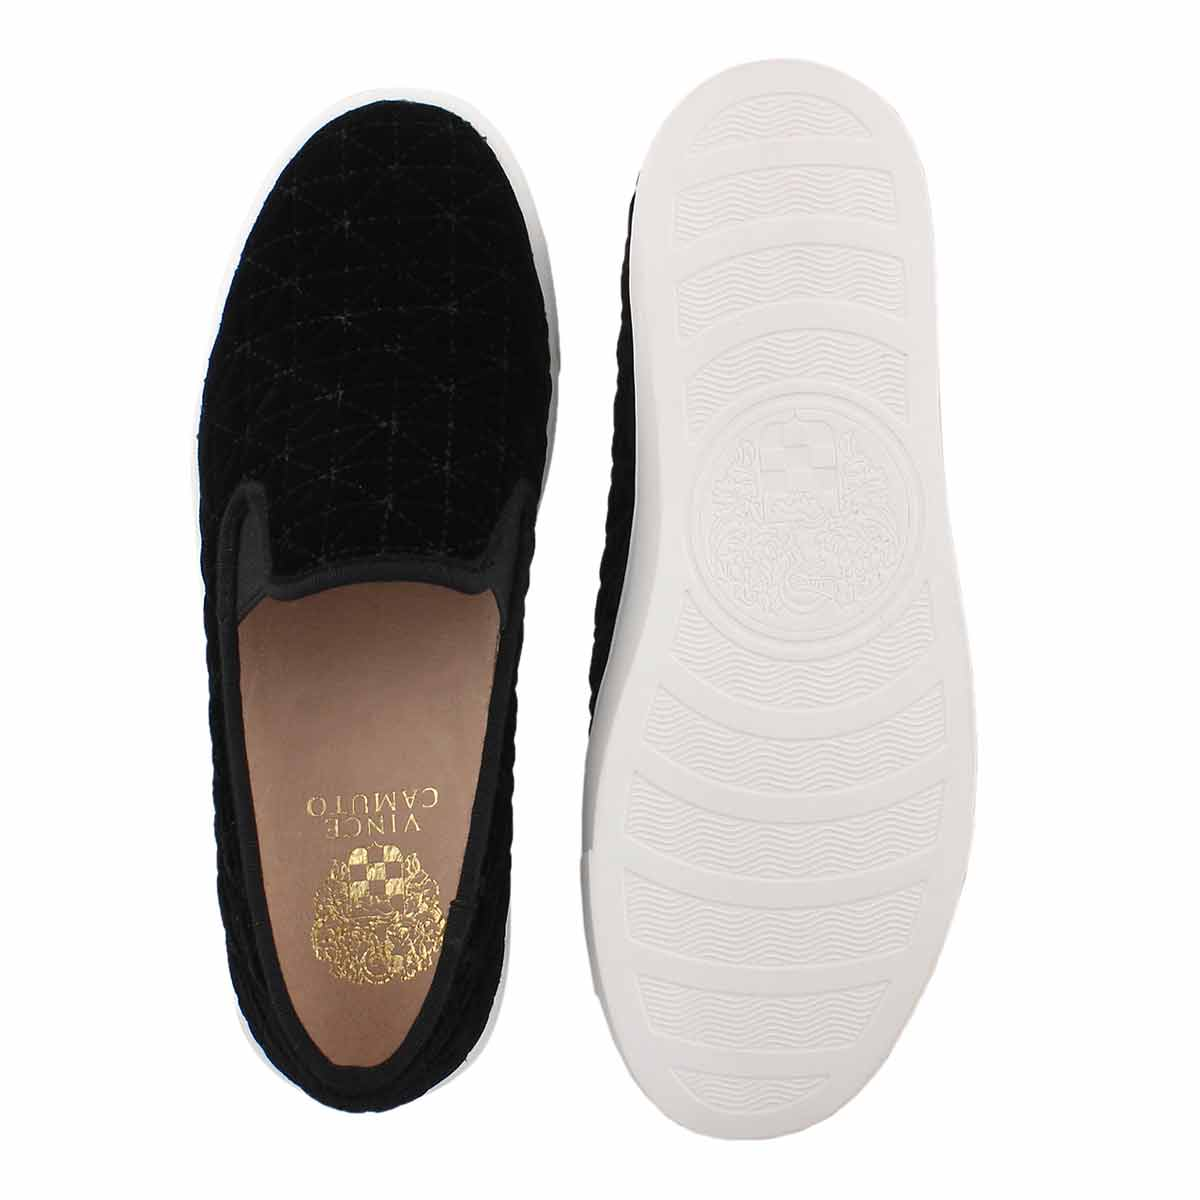 Lds Billena black casual slip on shoe